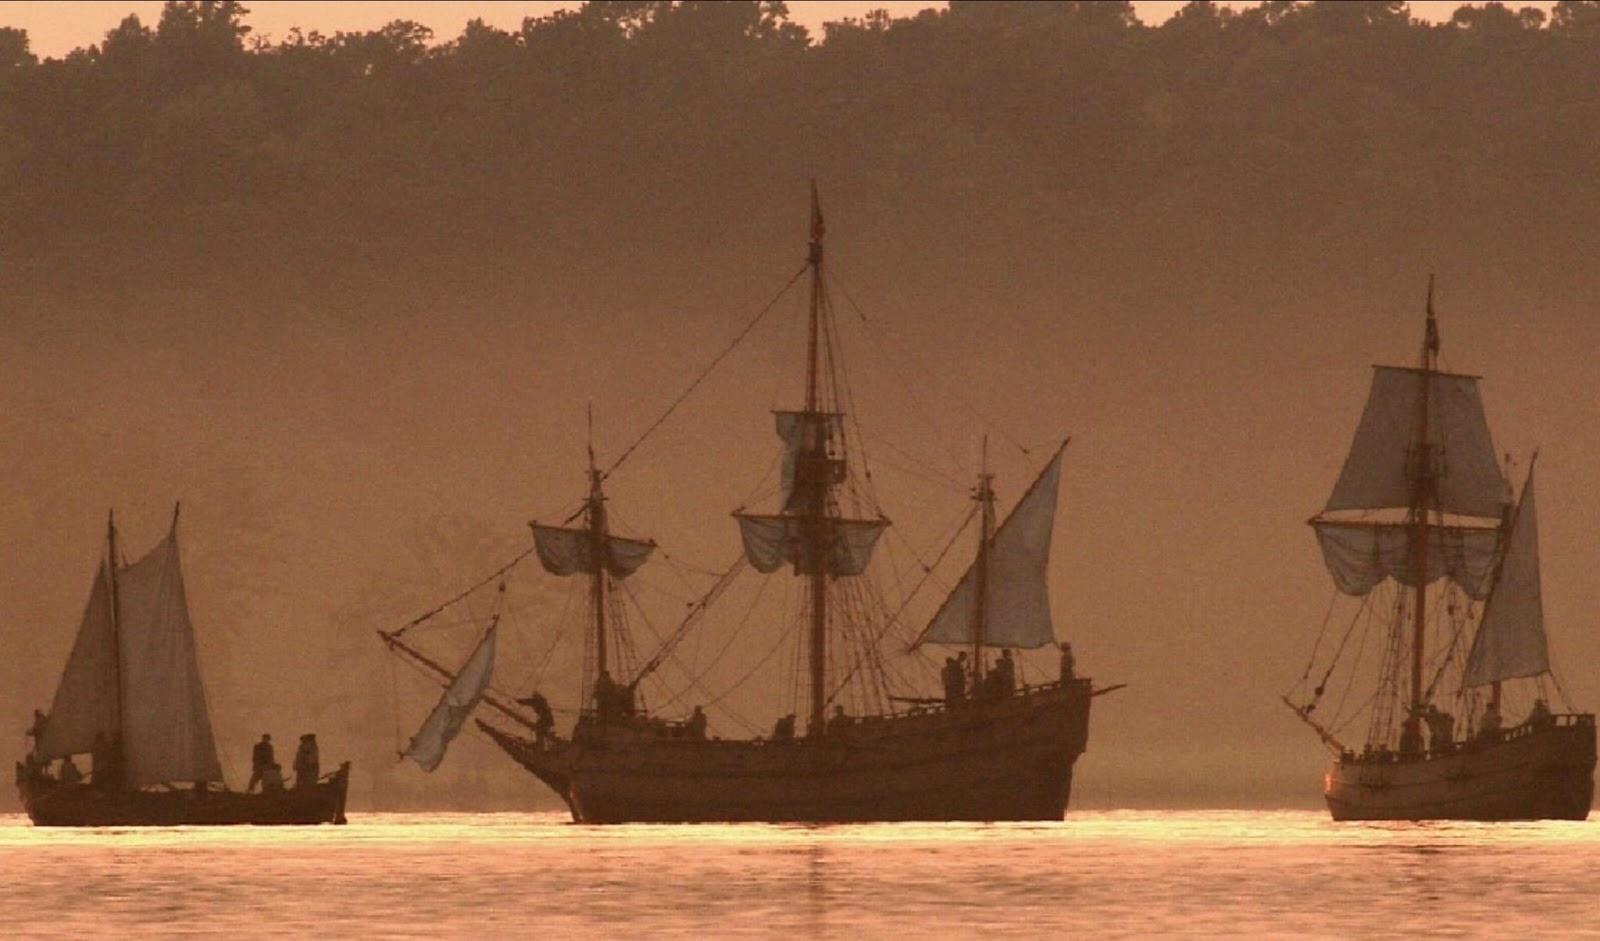 Spanish spy ships